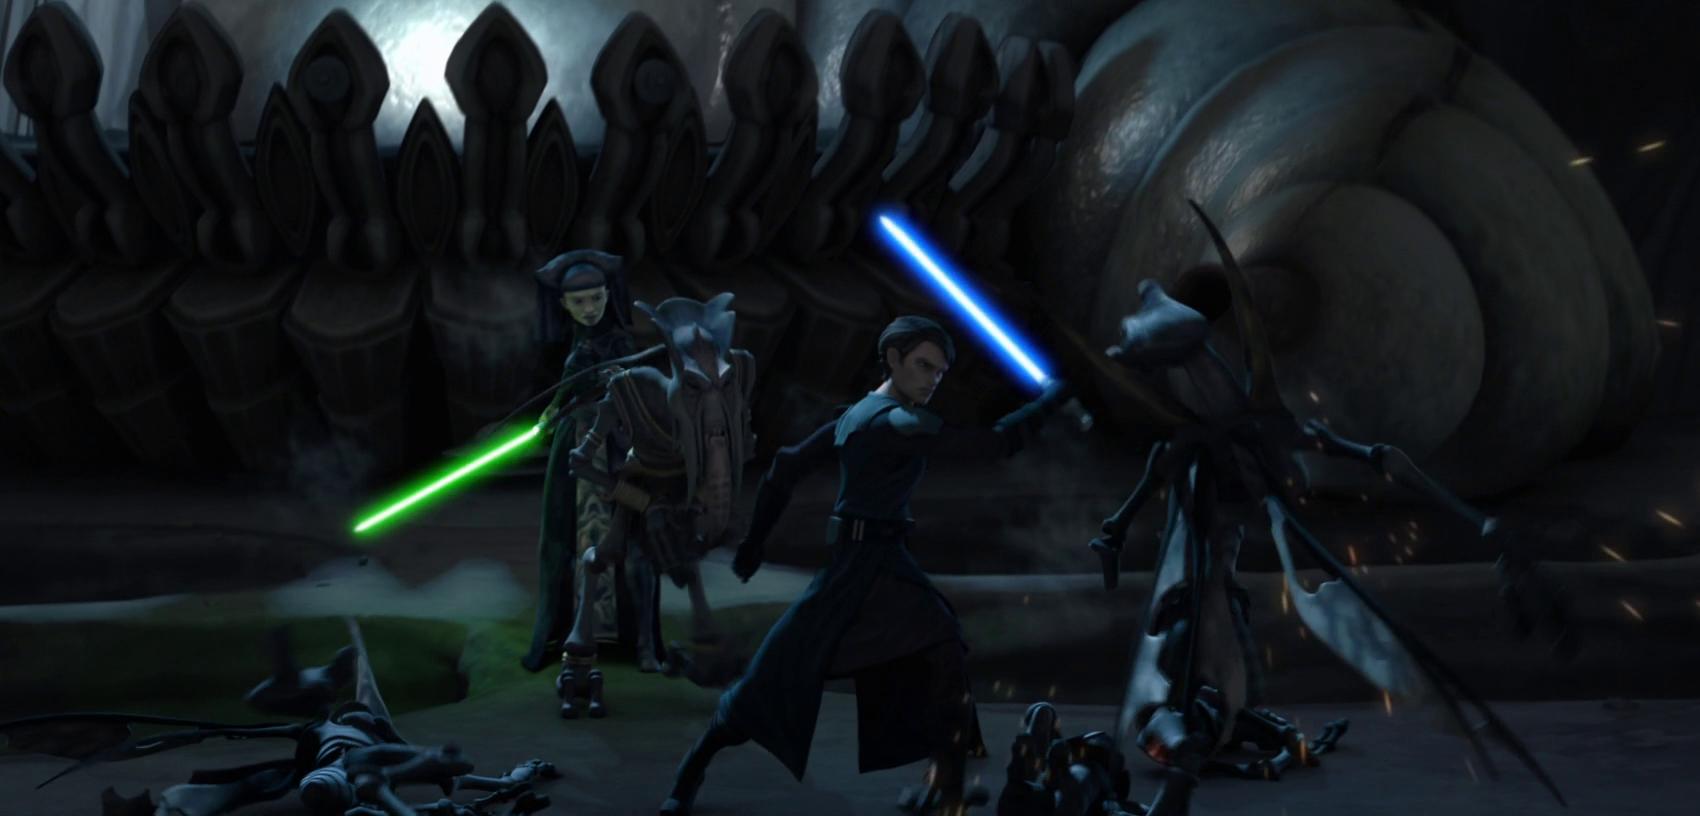 Second Battle Of Geonosis Wookieepedia The Star Wars Wiki